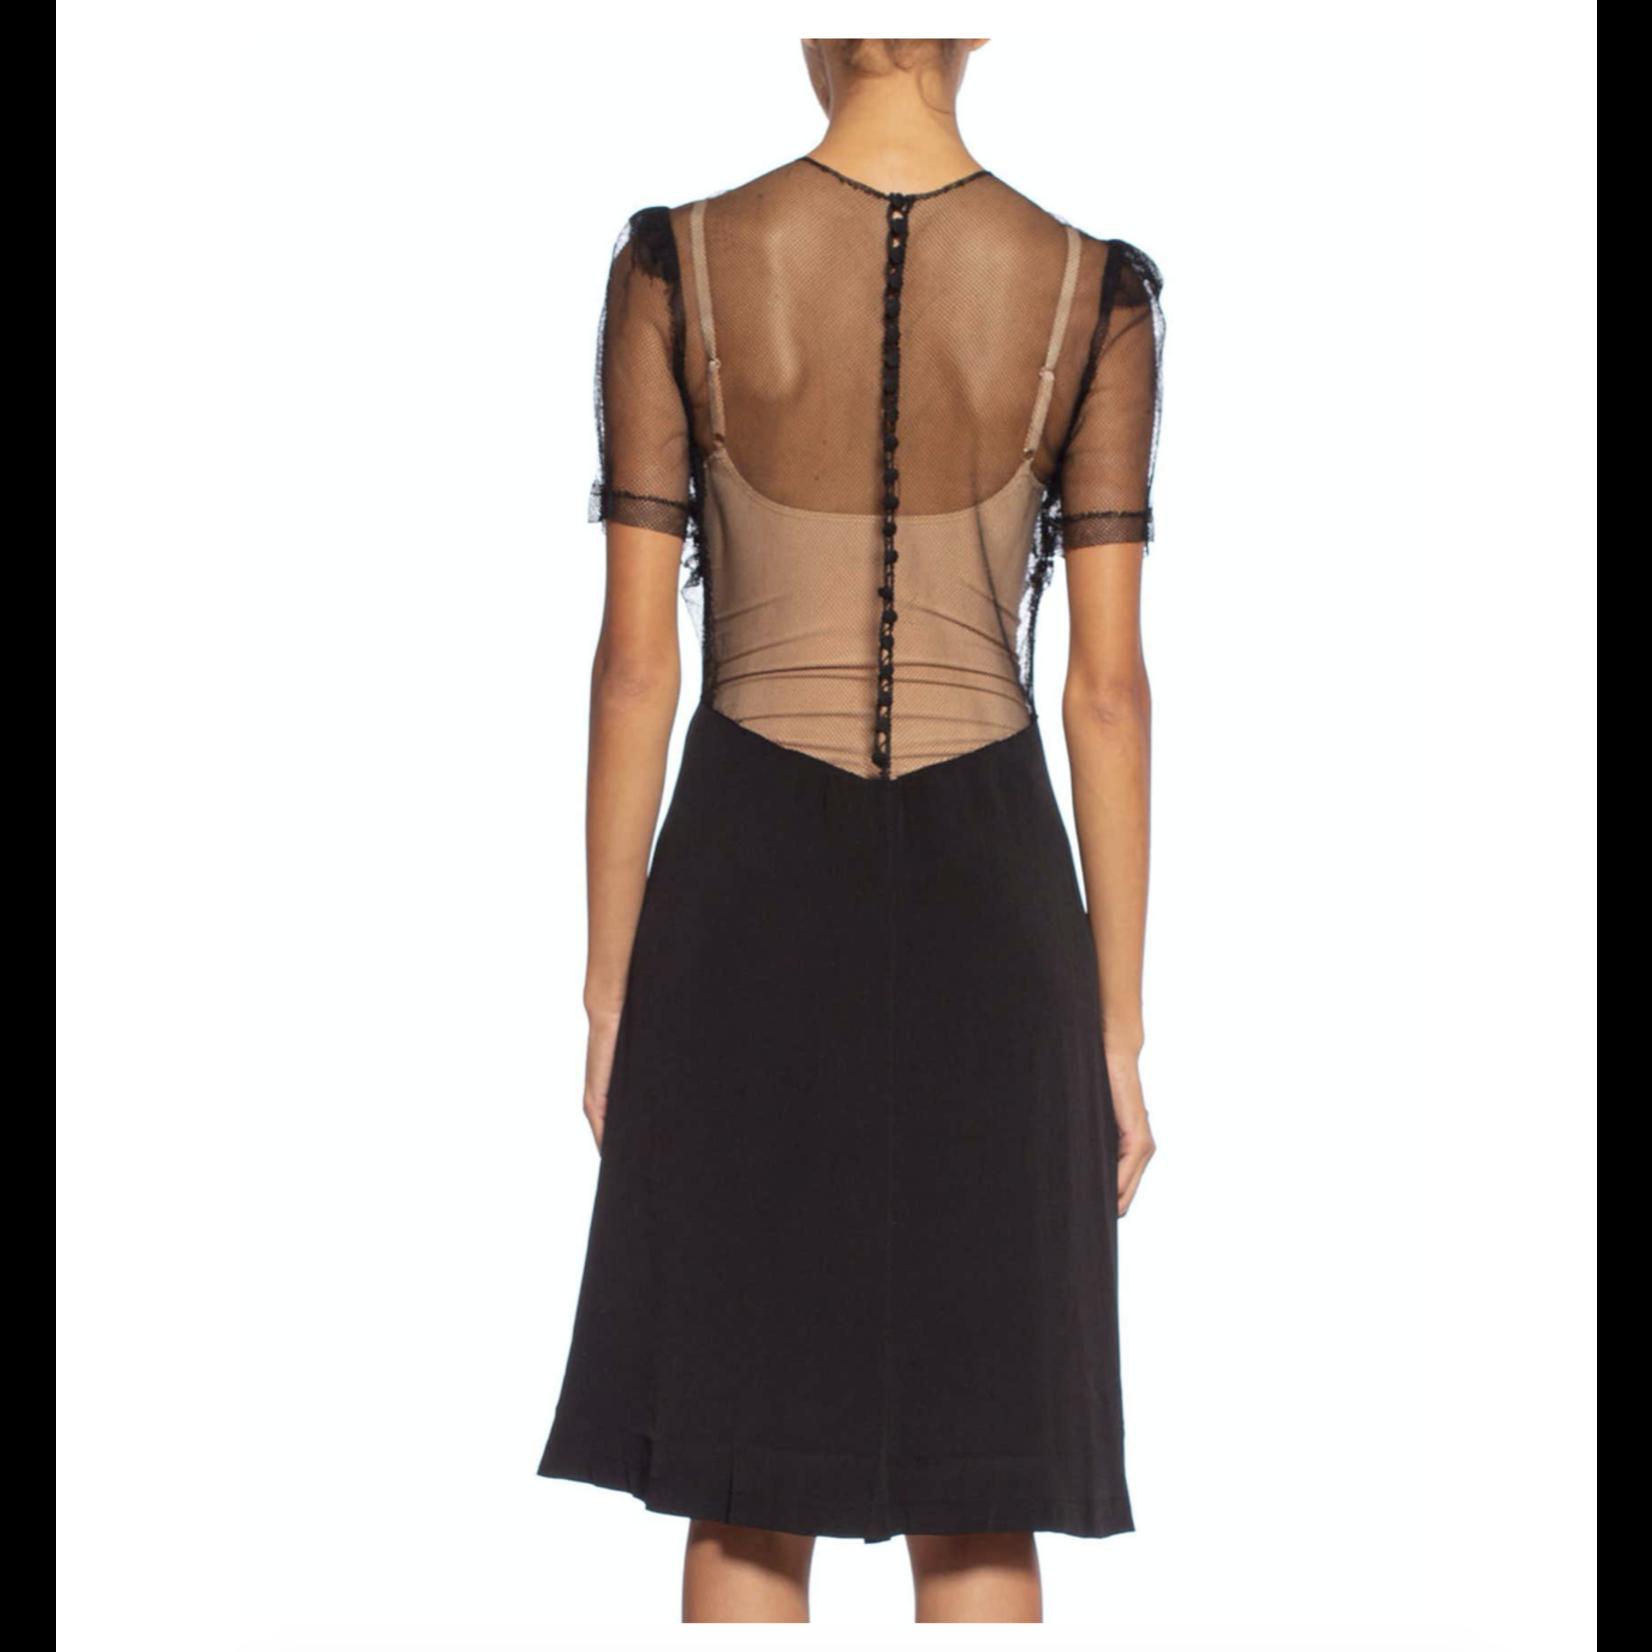 Wyld Blue Vintage 1940s Black Silk Bias & Net Dress 45DD8ON0730